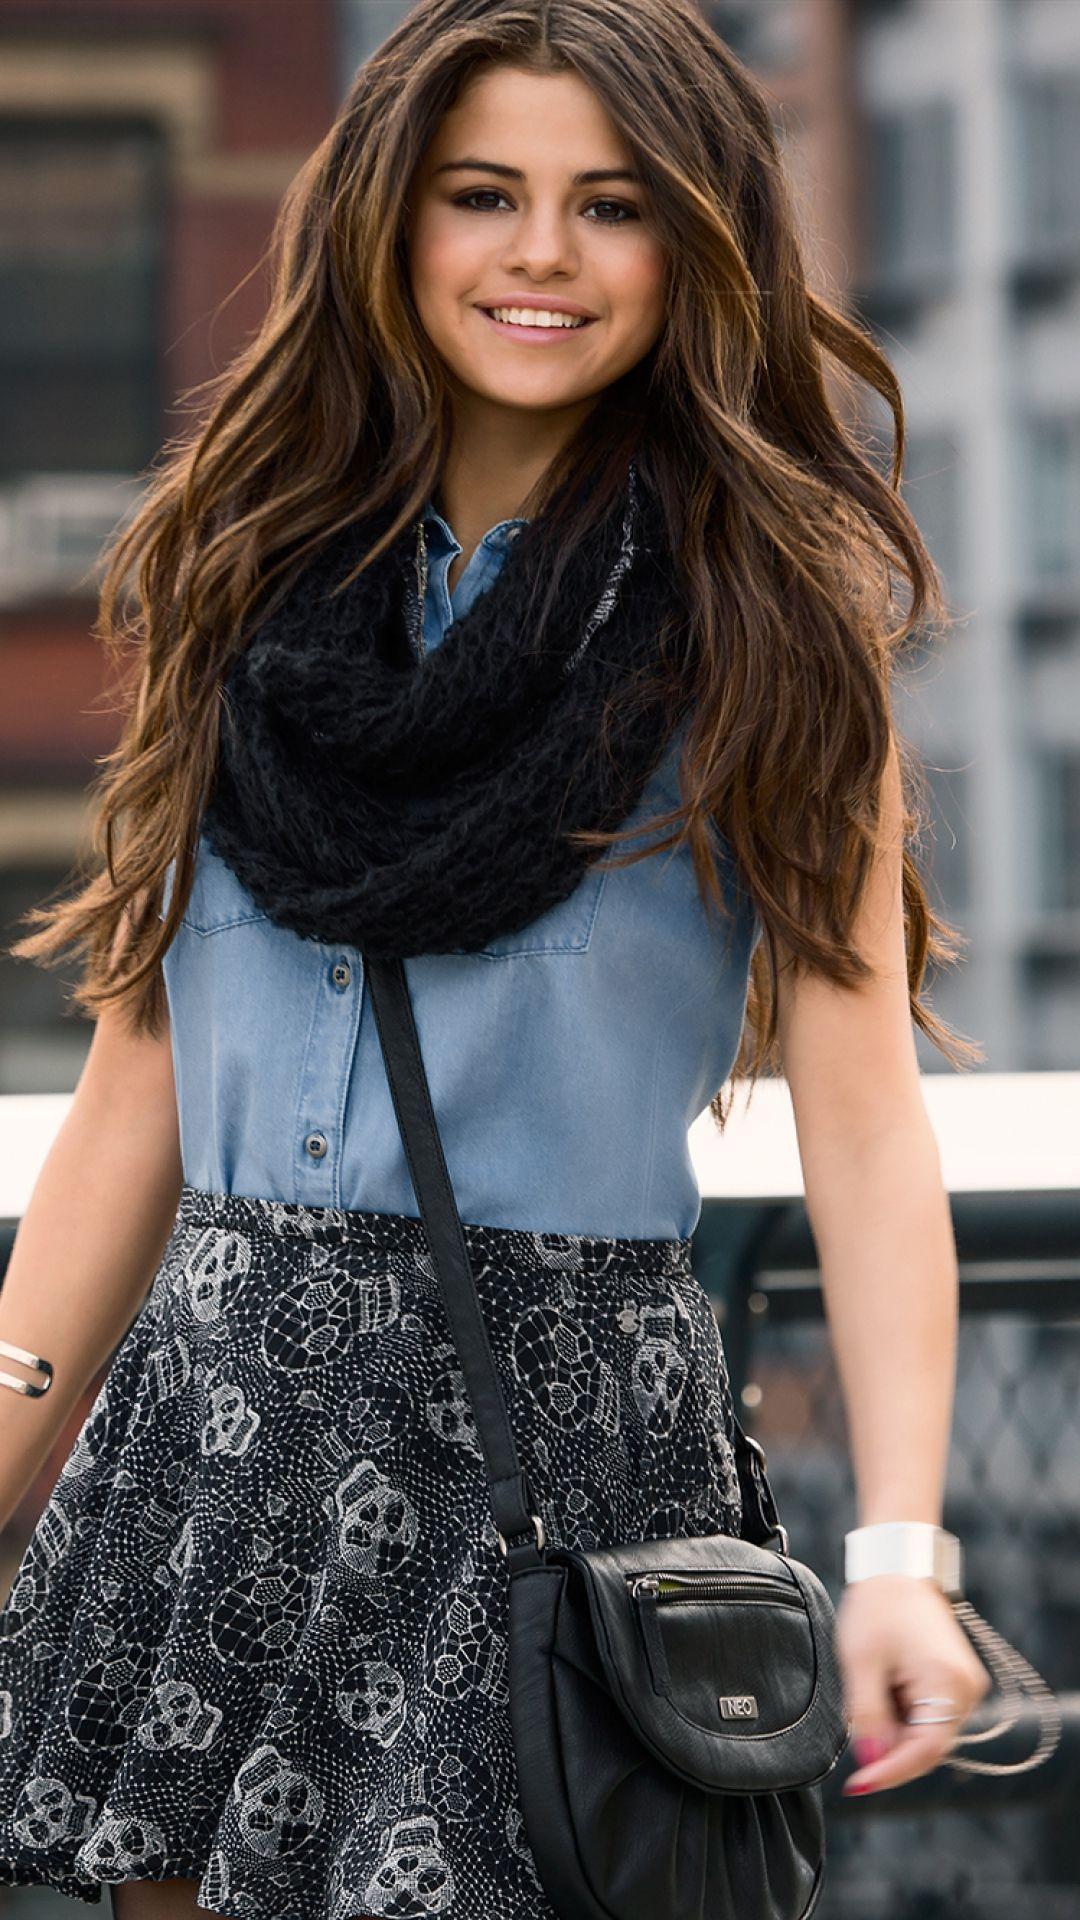 Selena Gomez 2018 Wallpapers - Wallpaper Cave